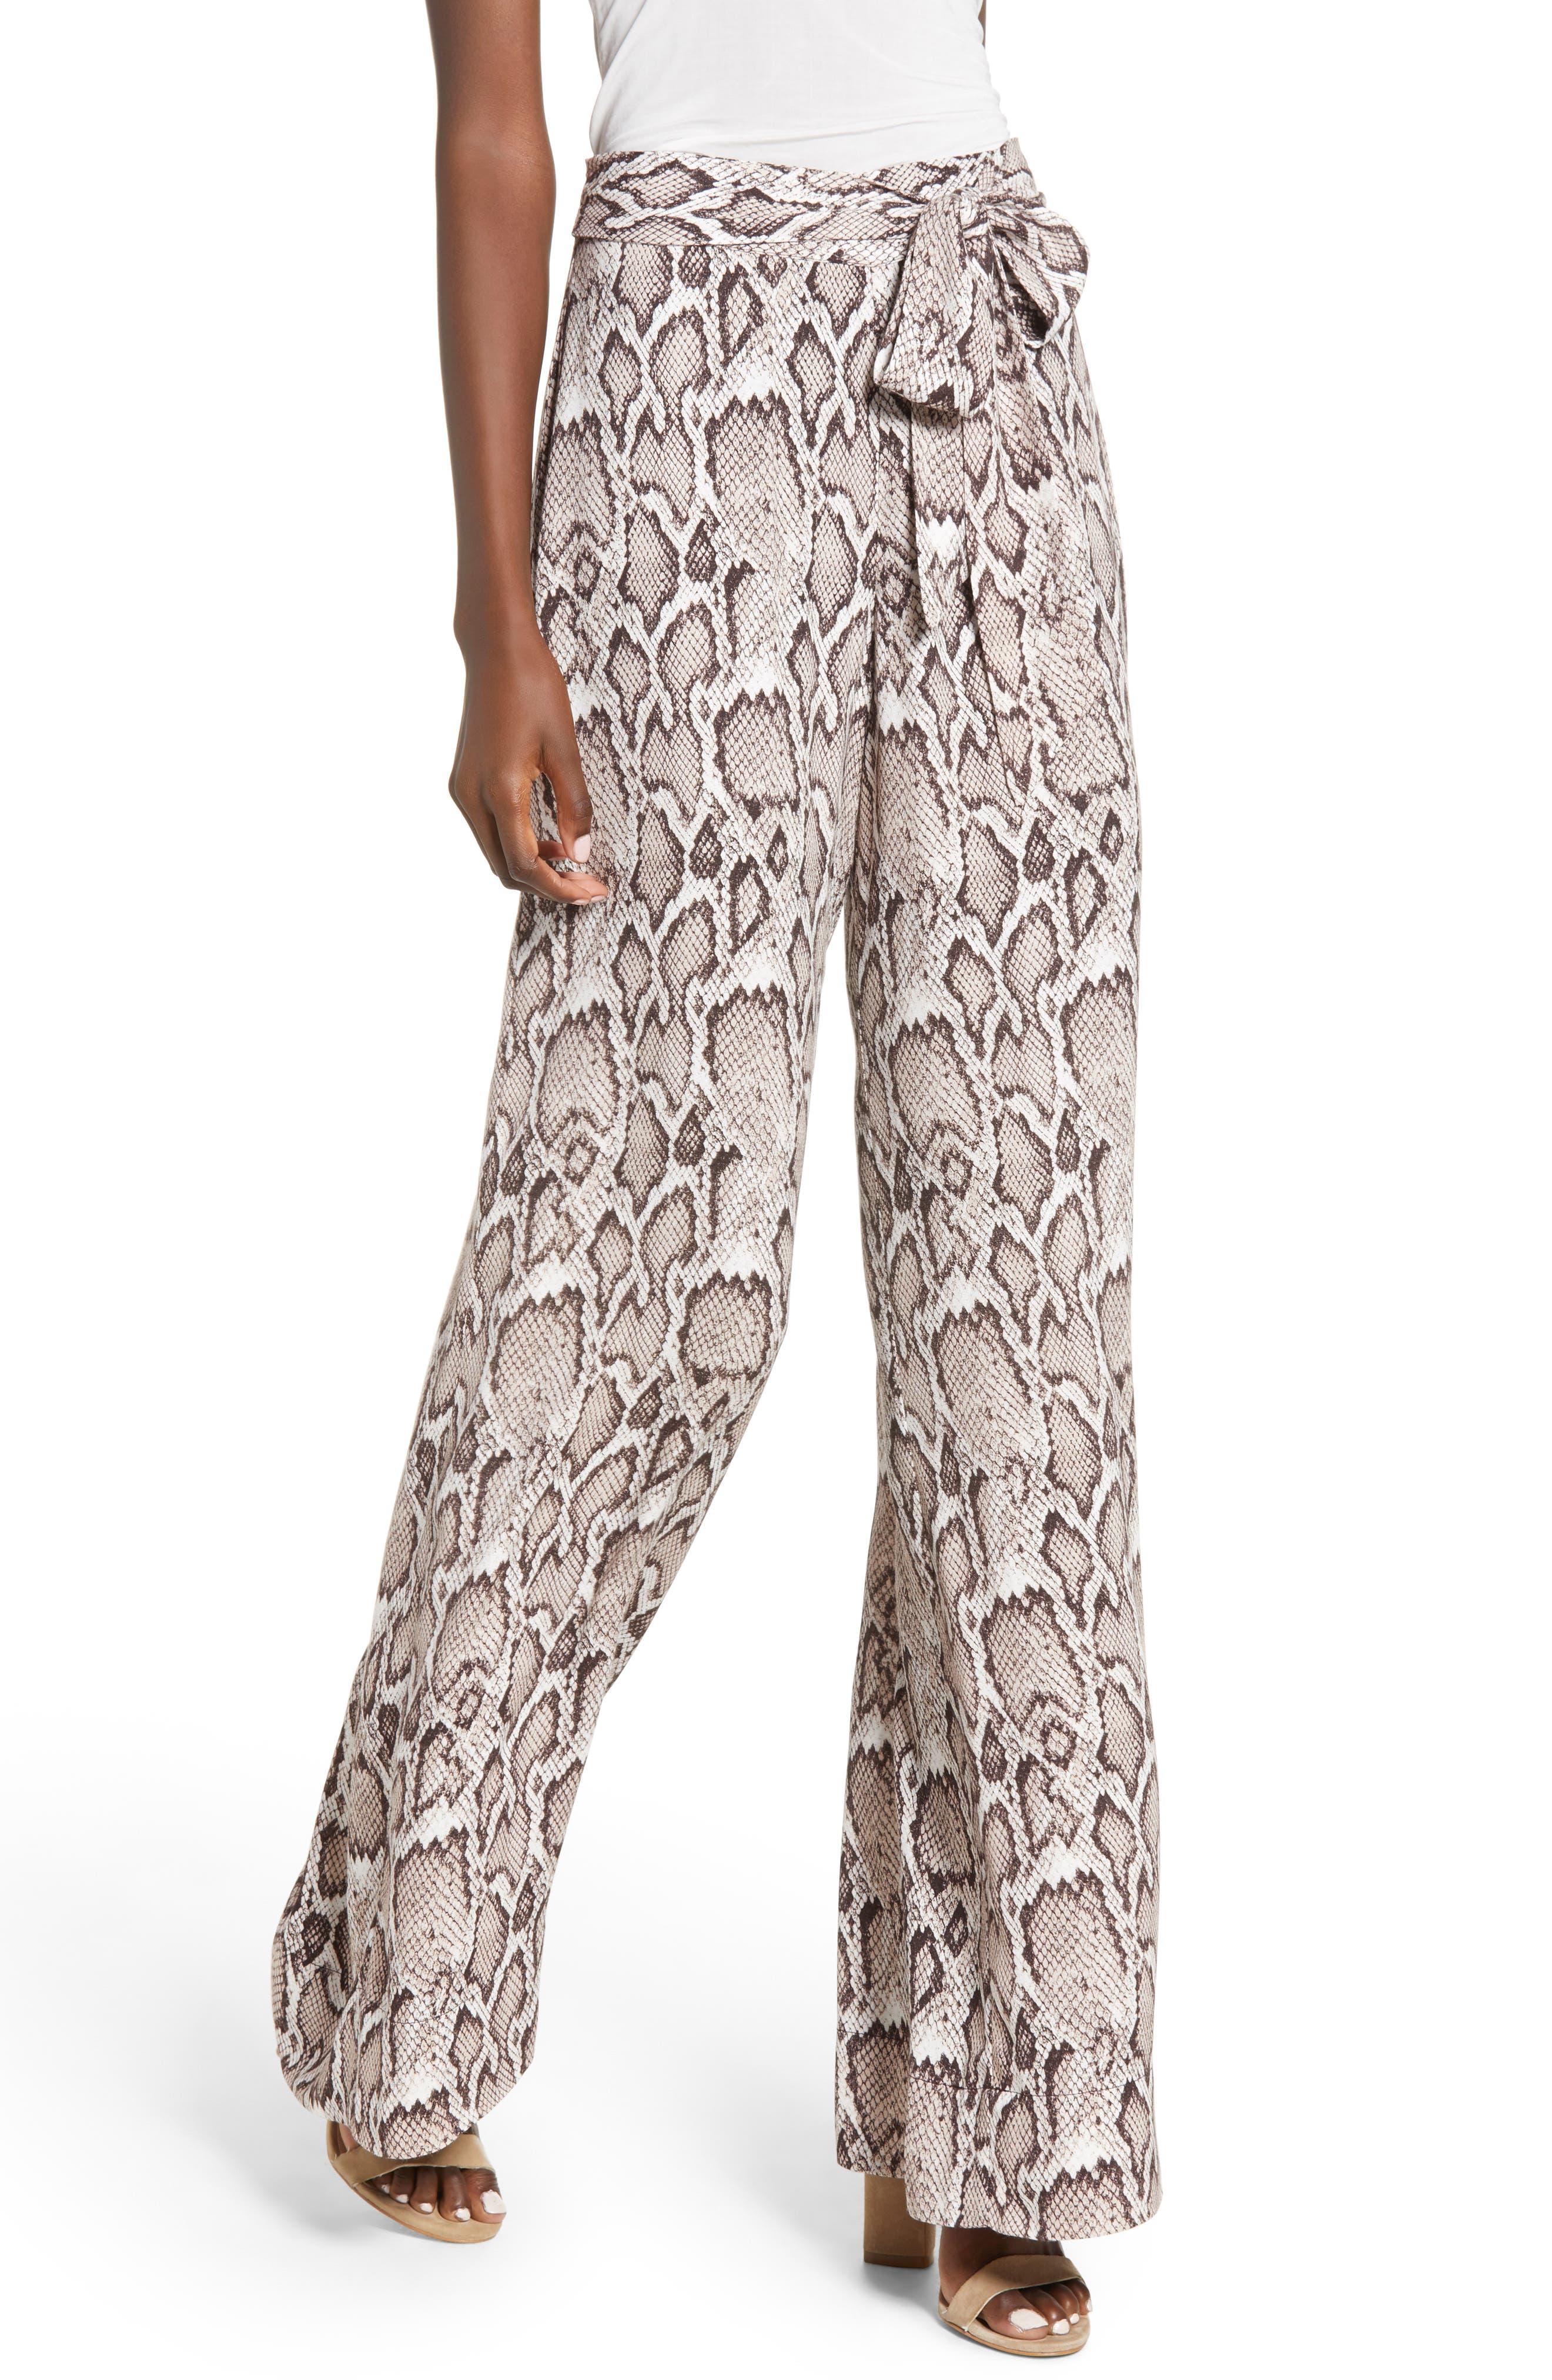 Caspian Wide Leg Pants,                         Main,                         color, SNAKESKIN